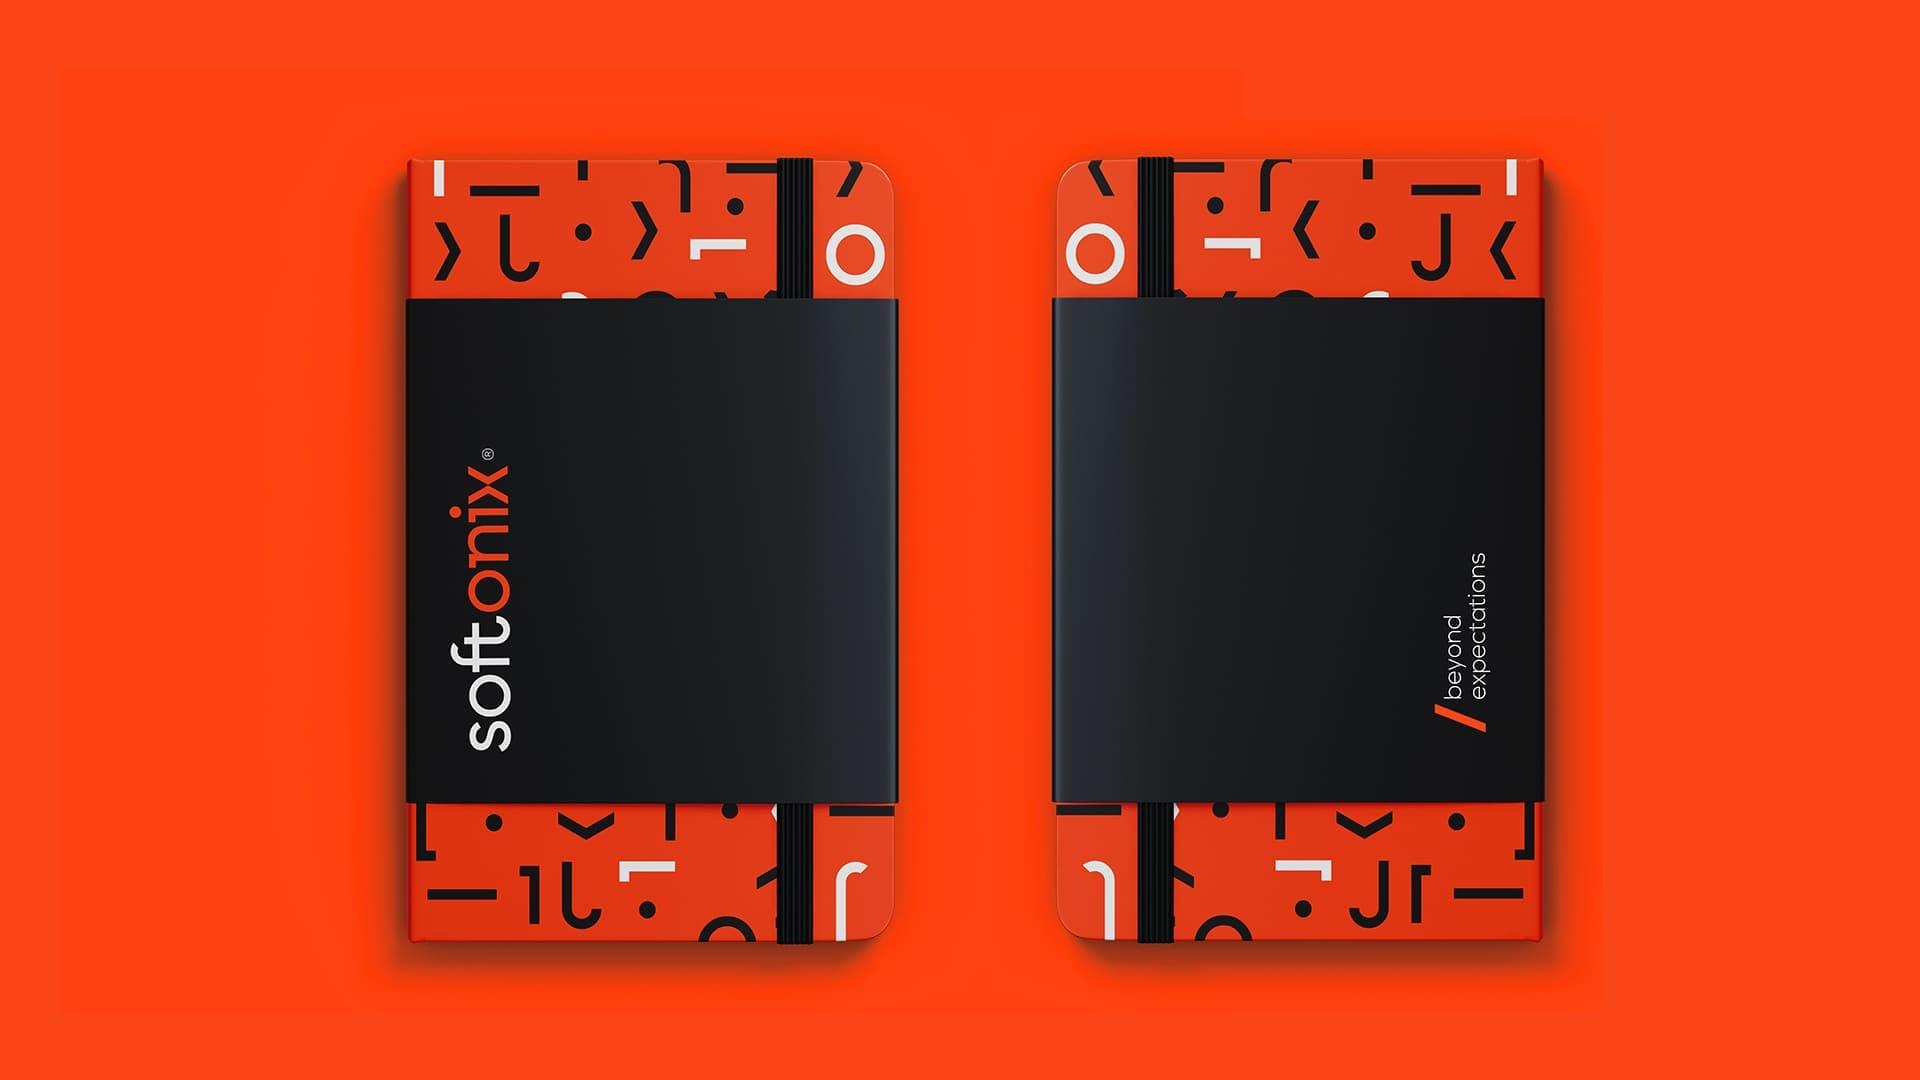 gra brand design softonix 11